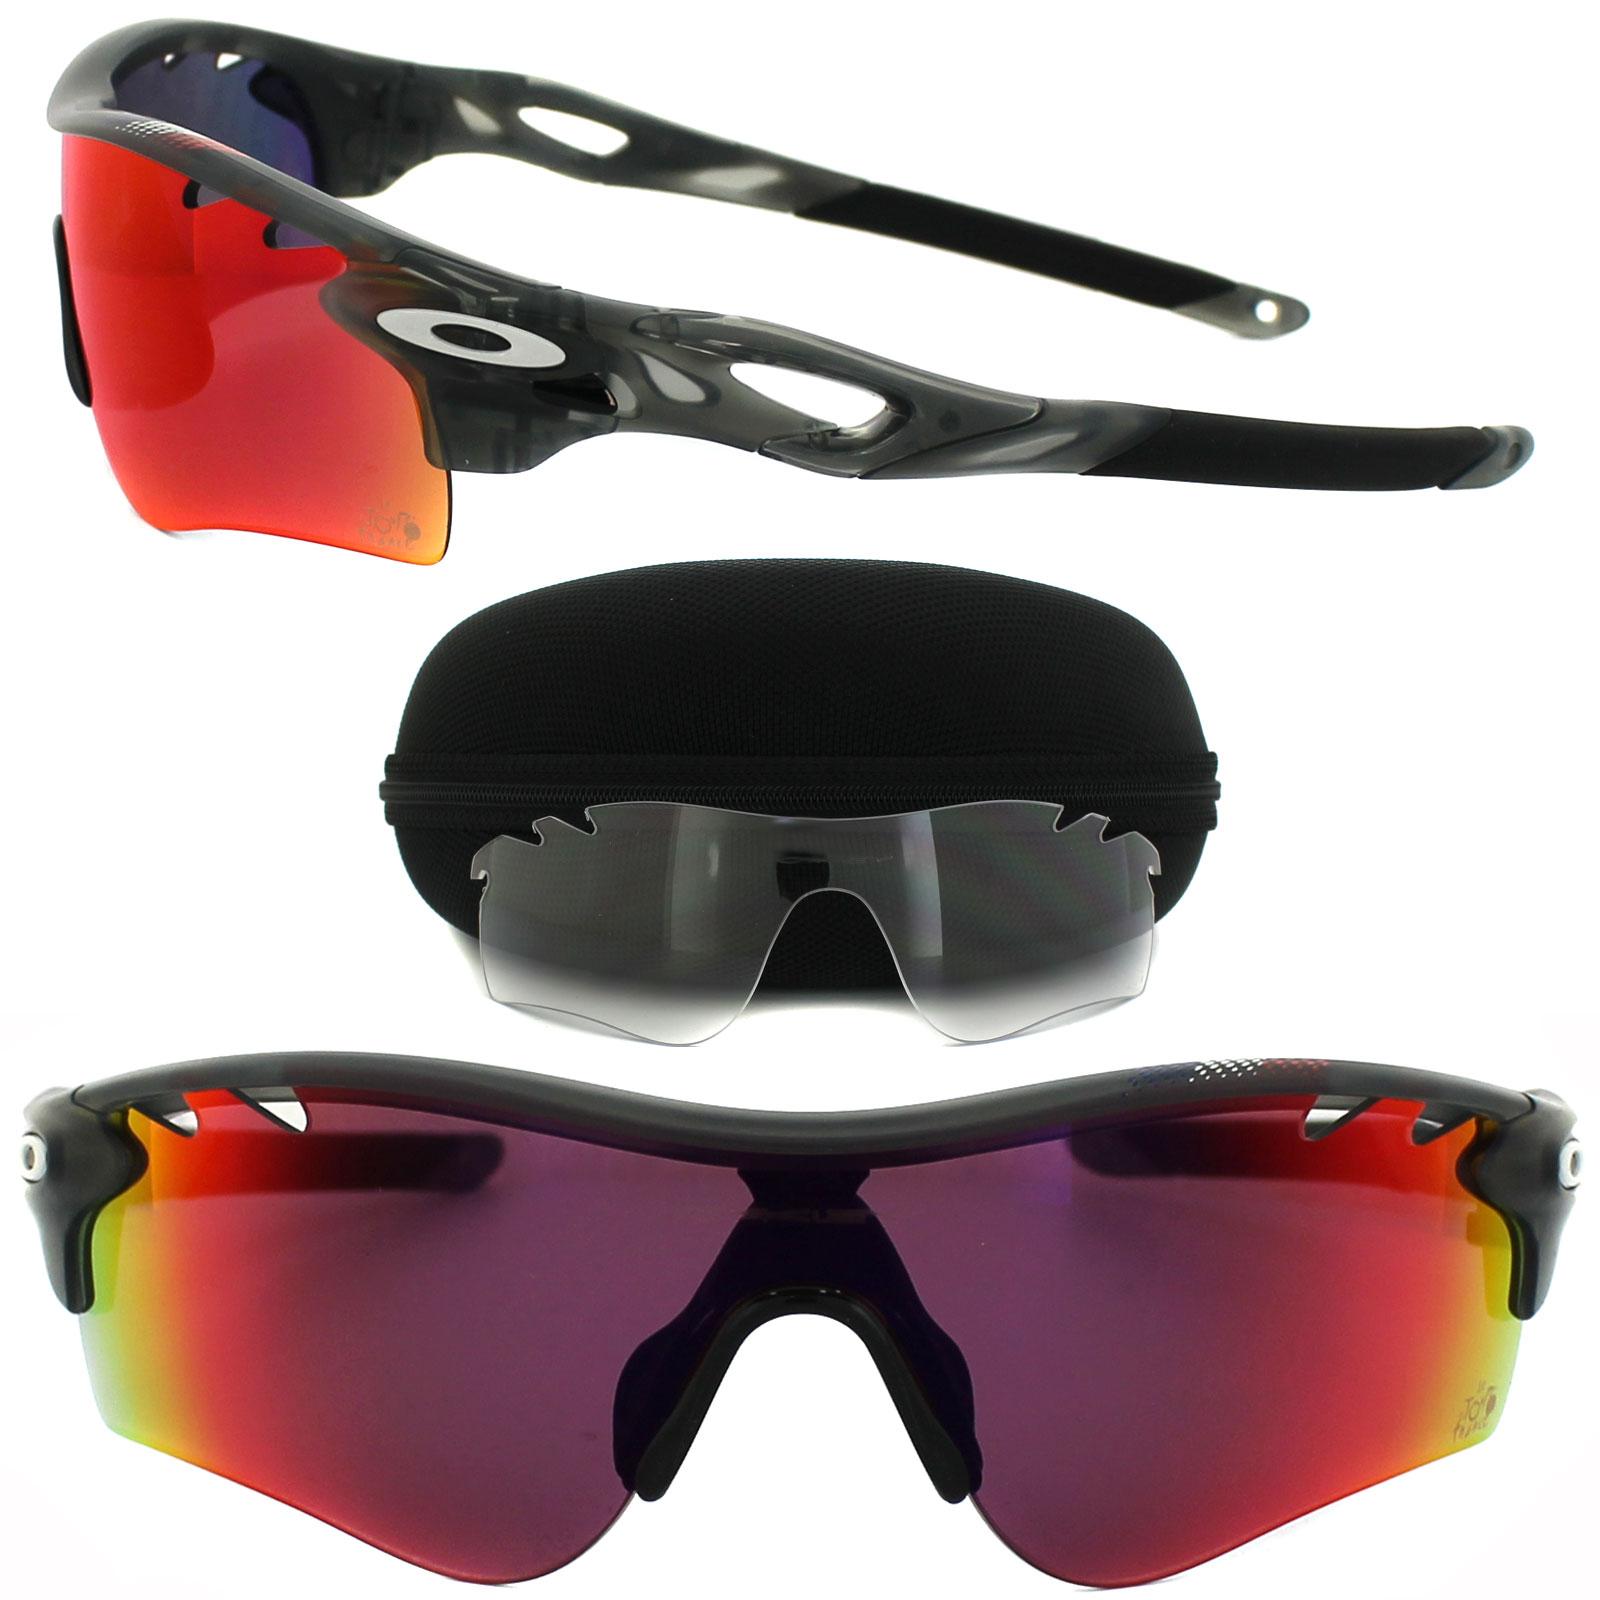 oakley radarlock accessories